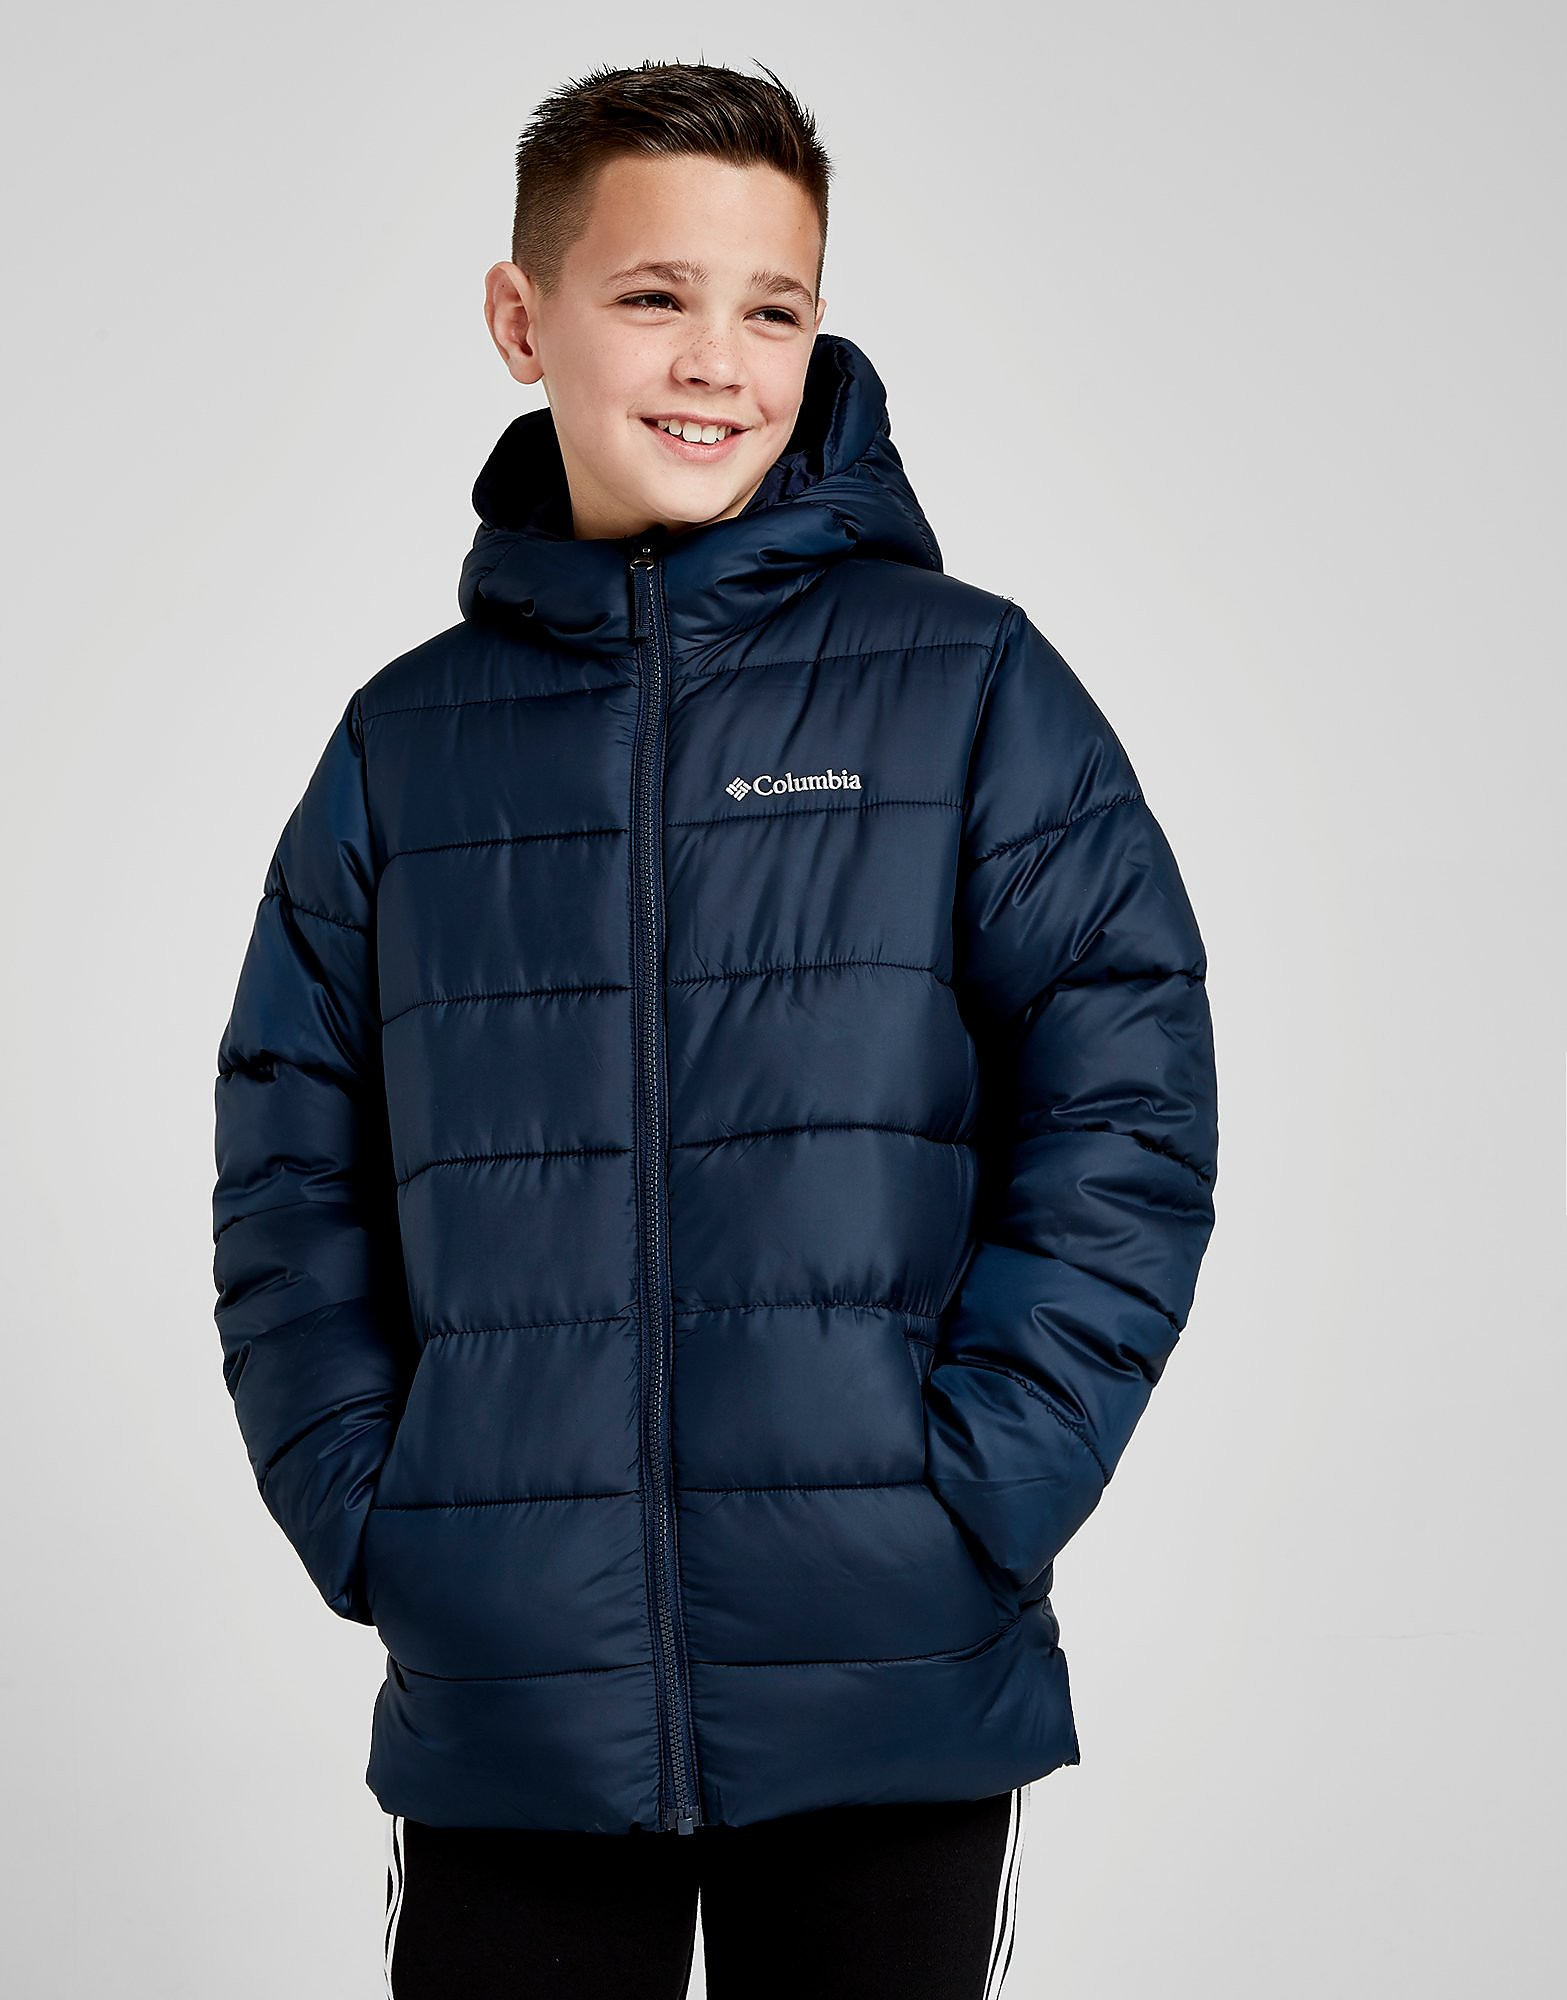 Columbia Puffer Jacket Junior - Blauw - Kind